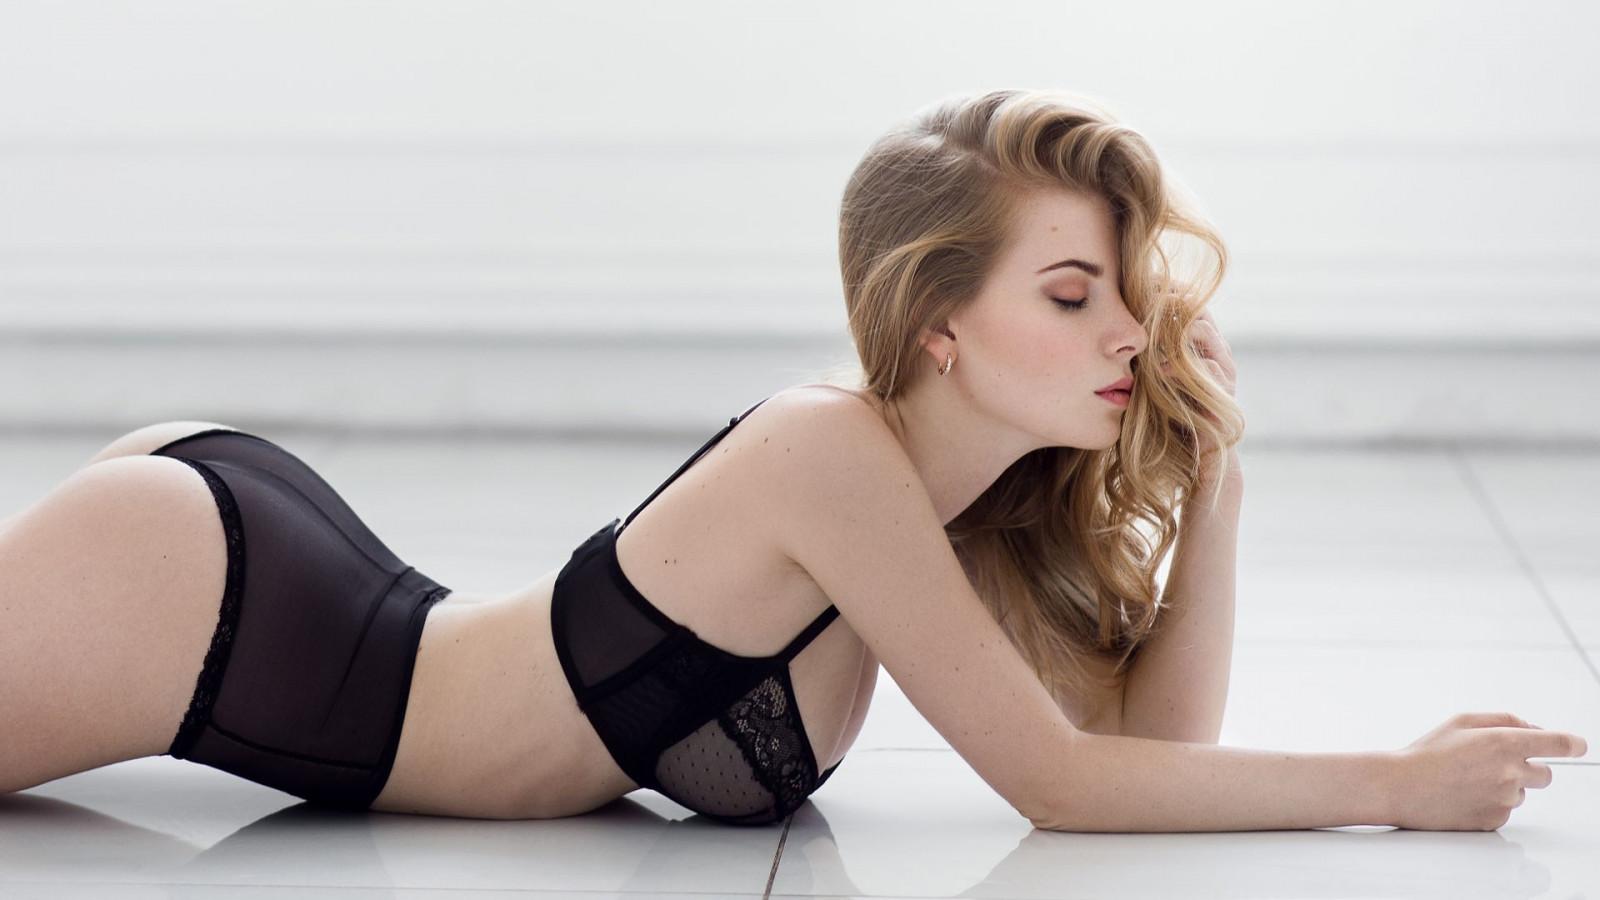 Wallpaper : women, model, blonde, long hair, sitting, high